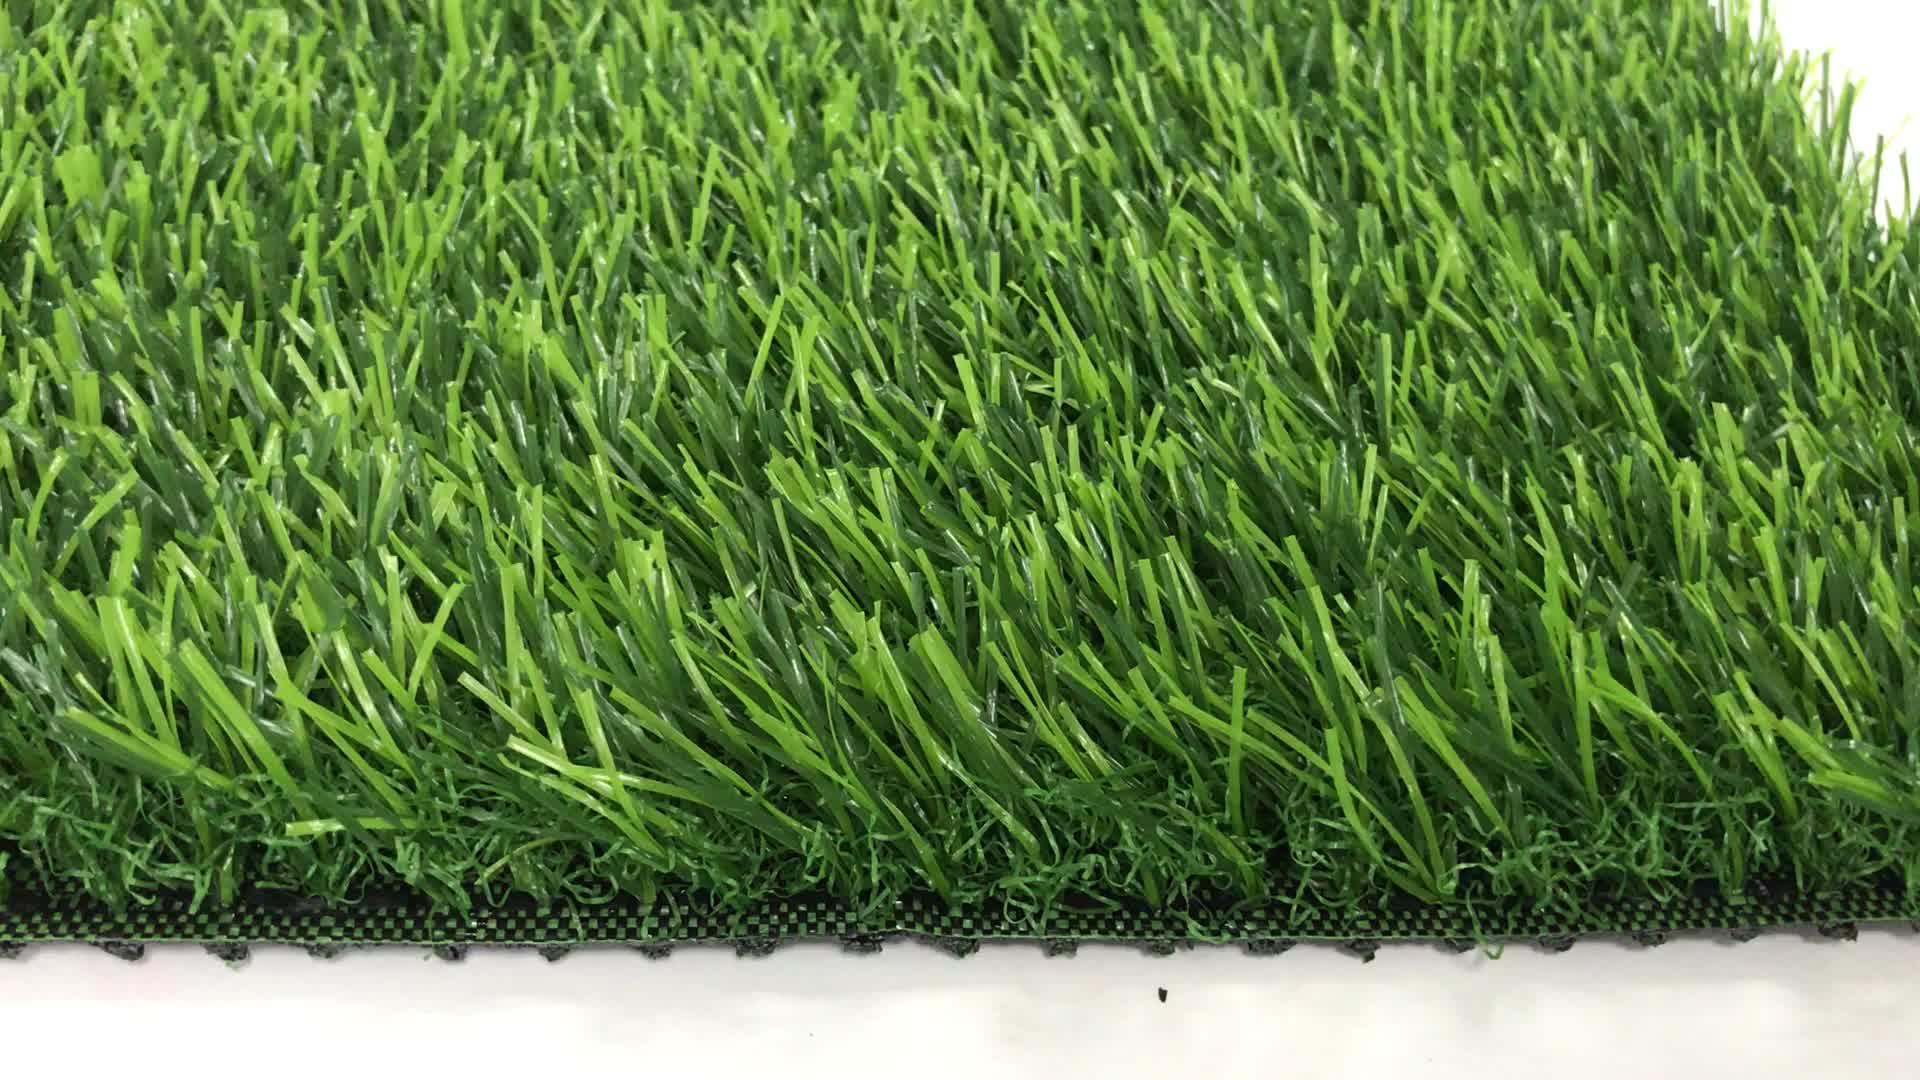 LW03 באיכות גבוהה C צורת דשא 38mm גינון דשא מלאכותי שטיח עבור גן משחקים